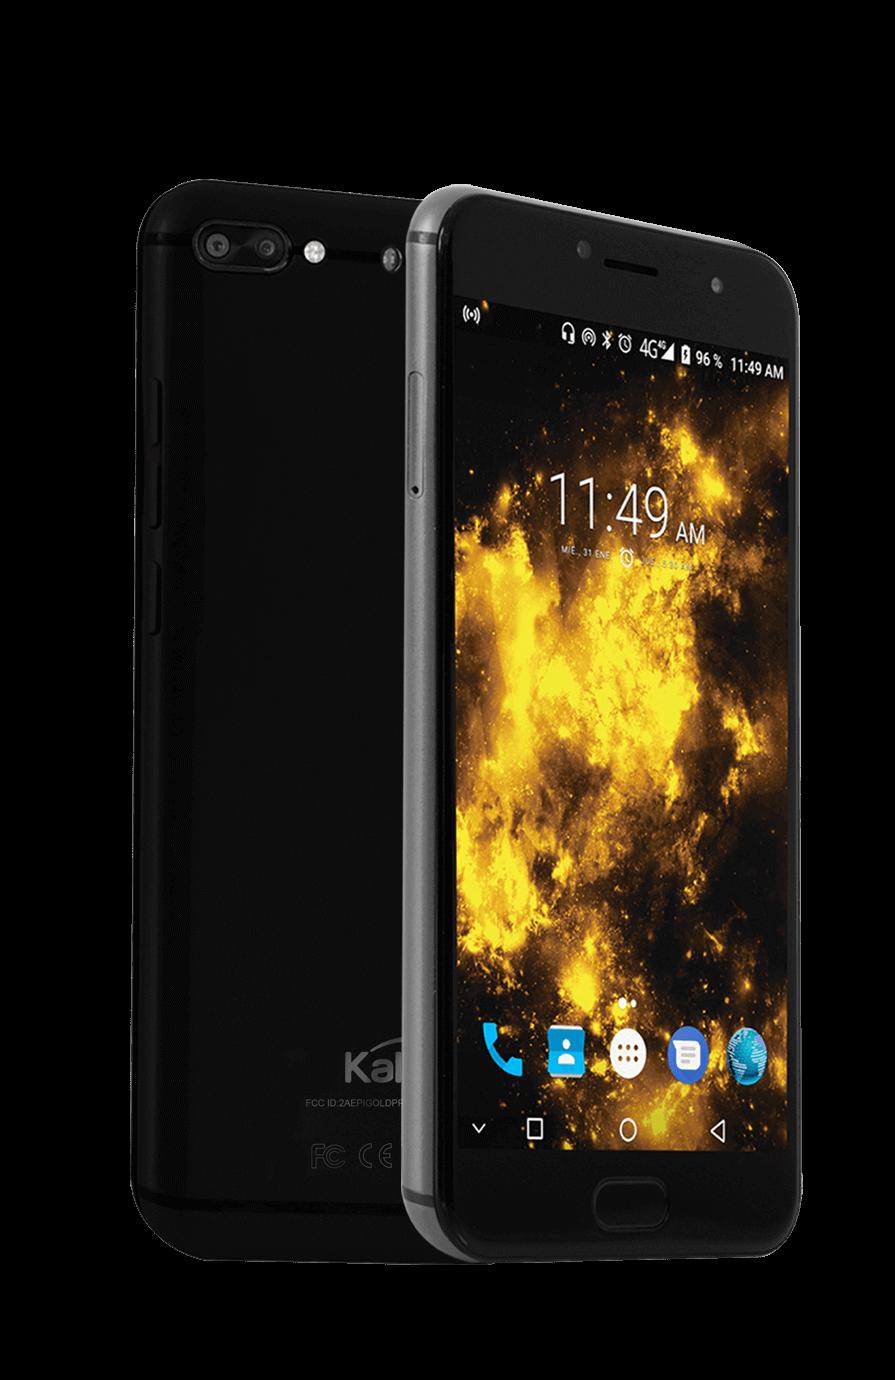 0a02422b75d Celular Libre KALLEY Gold Negro DS 4G Alkosto Tienda Online